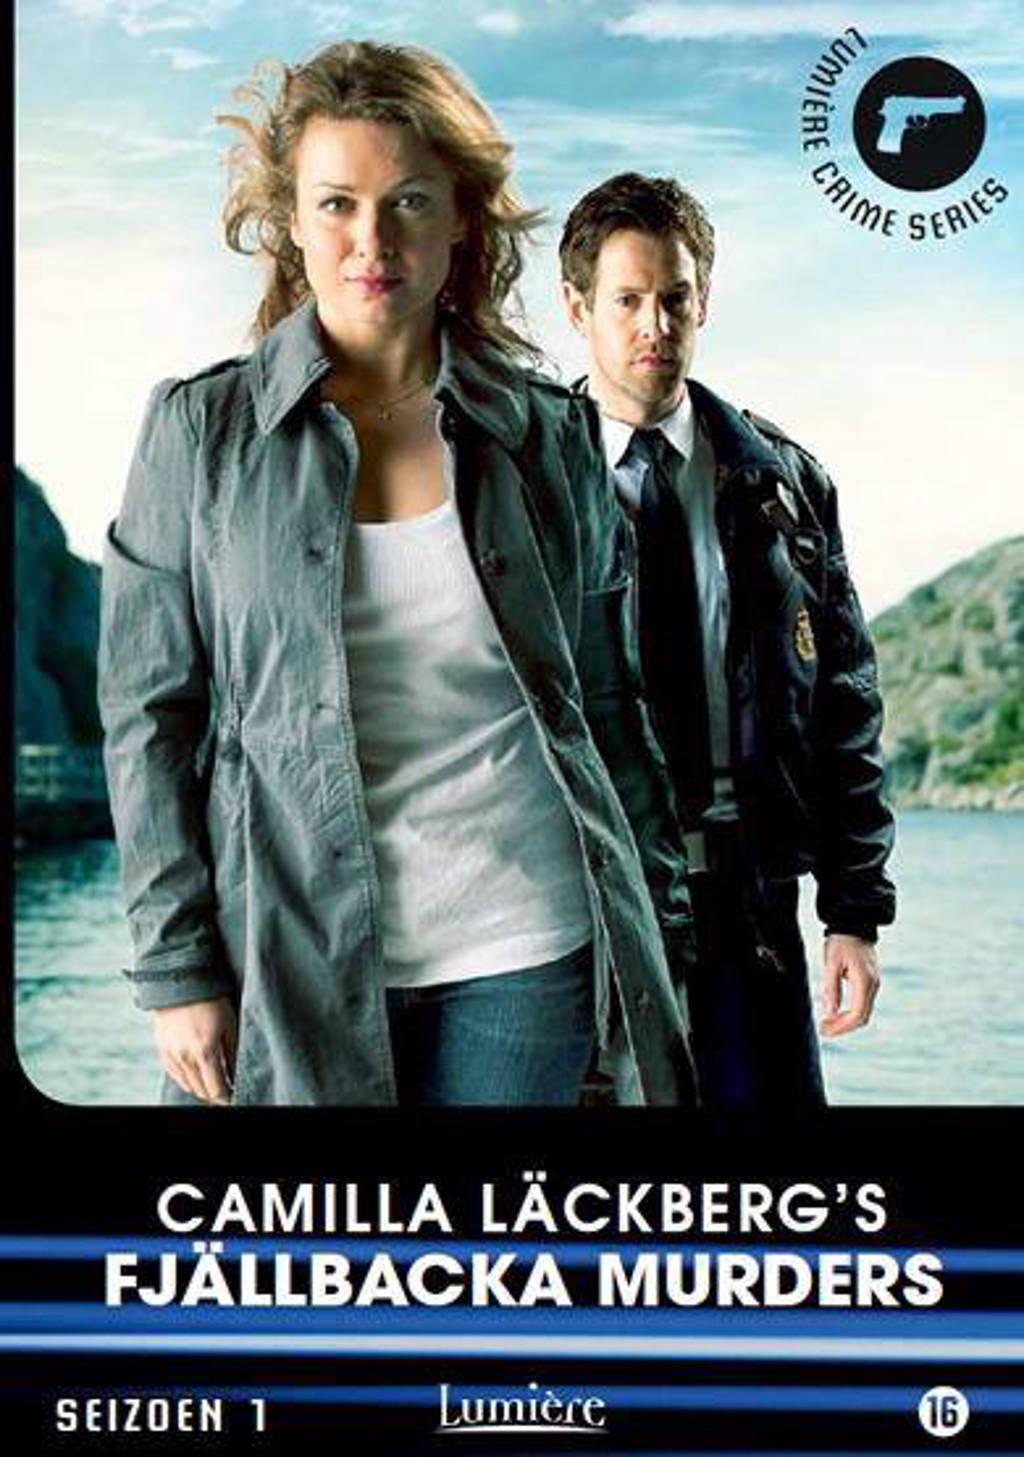 Camilla Lackbergs fjallbacka murders - Seizoen 1 (DVD)